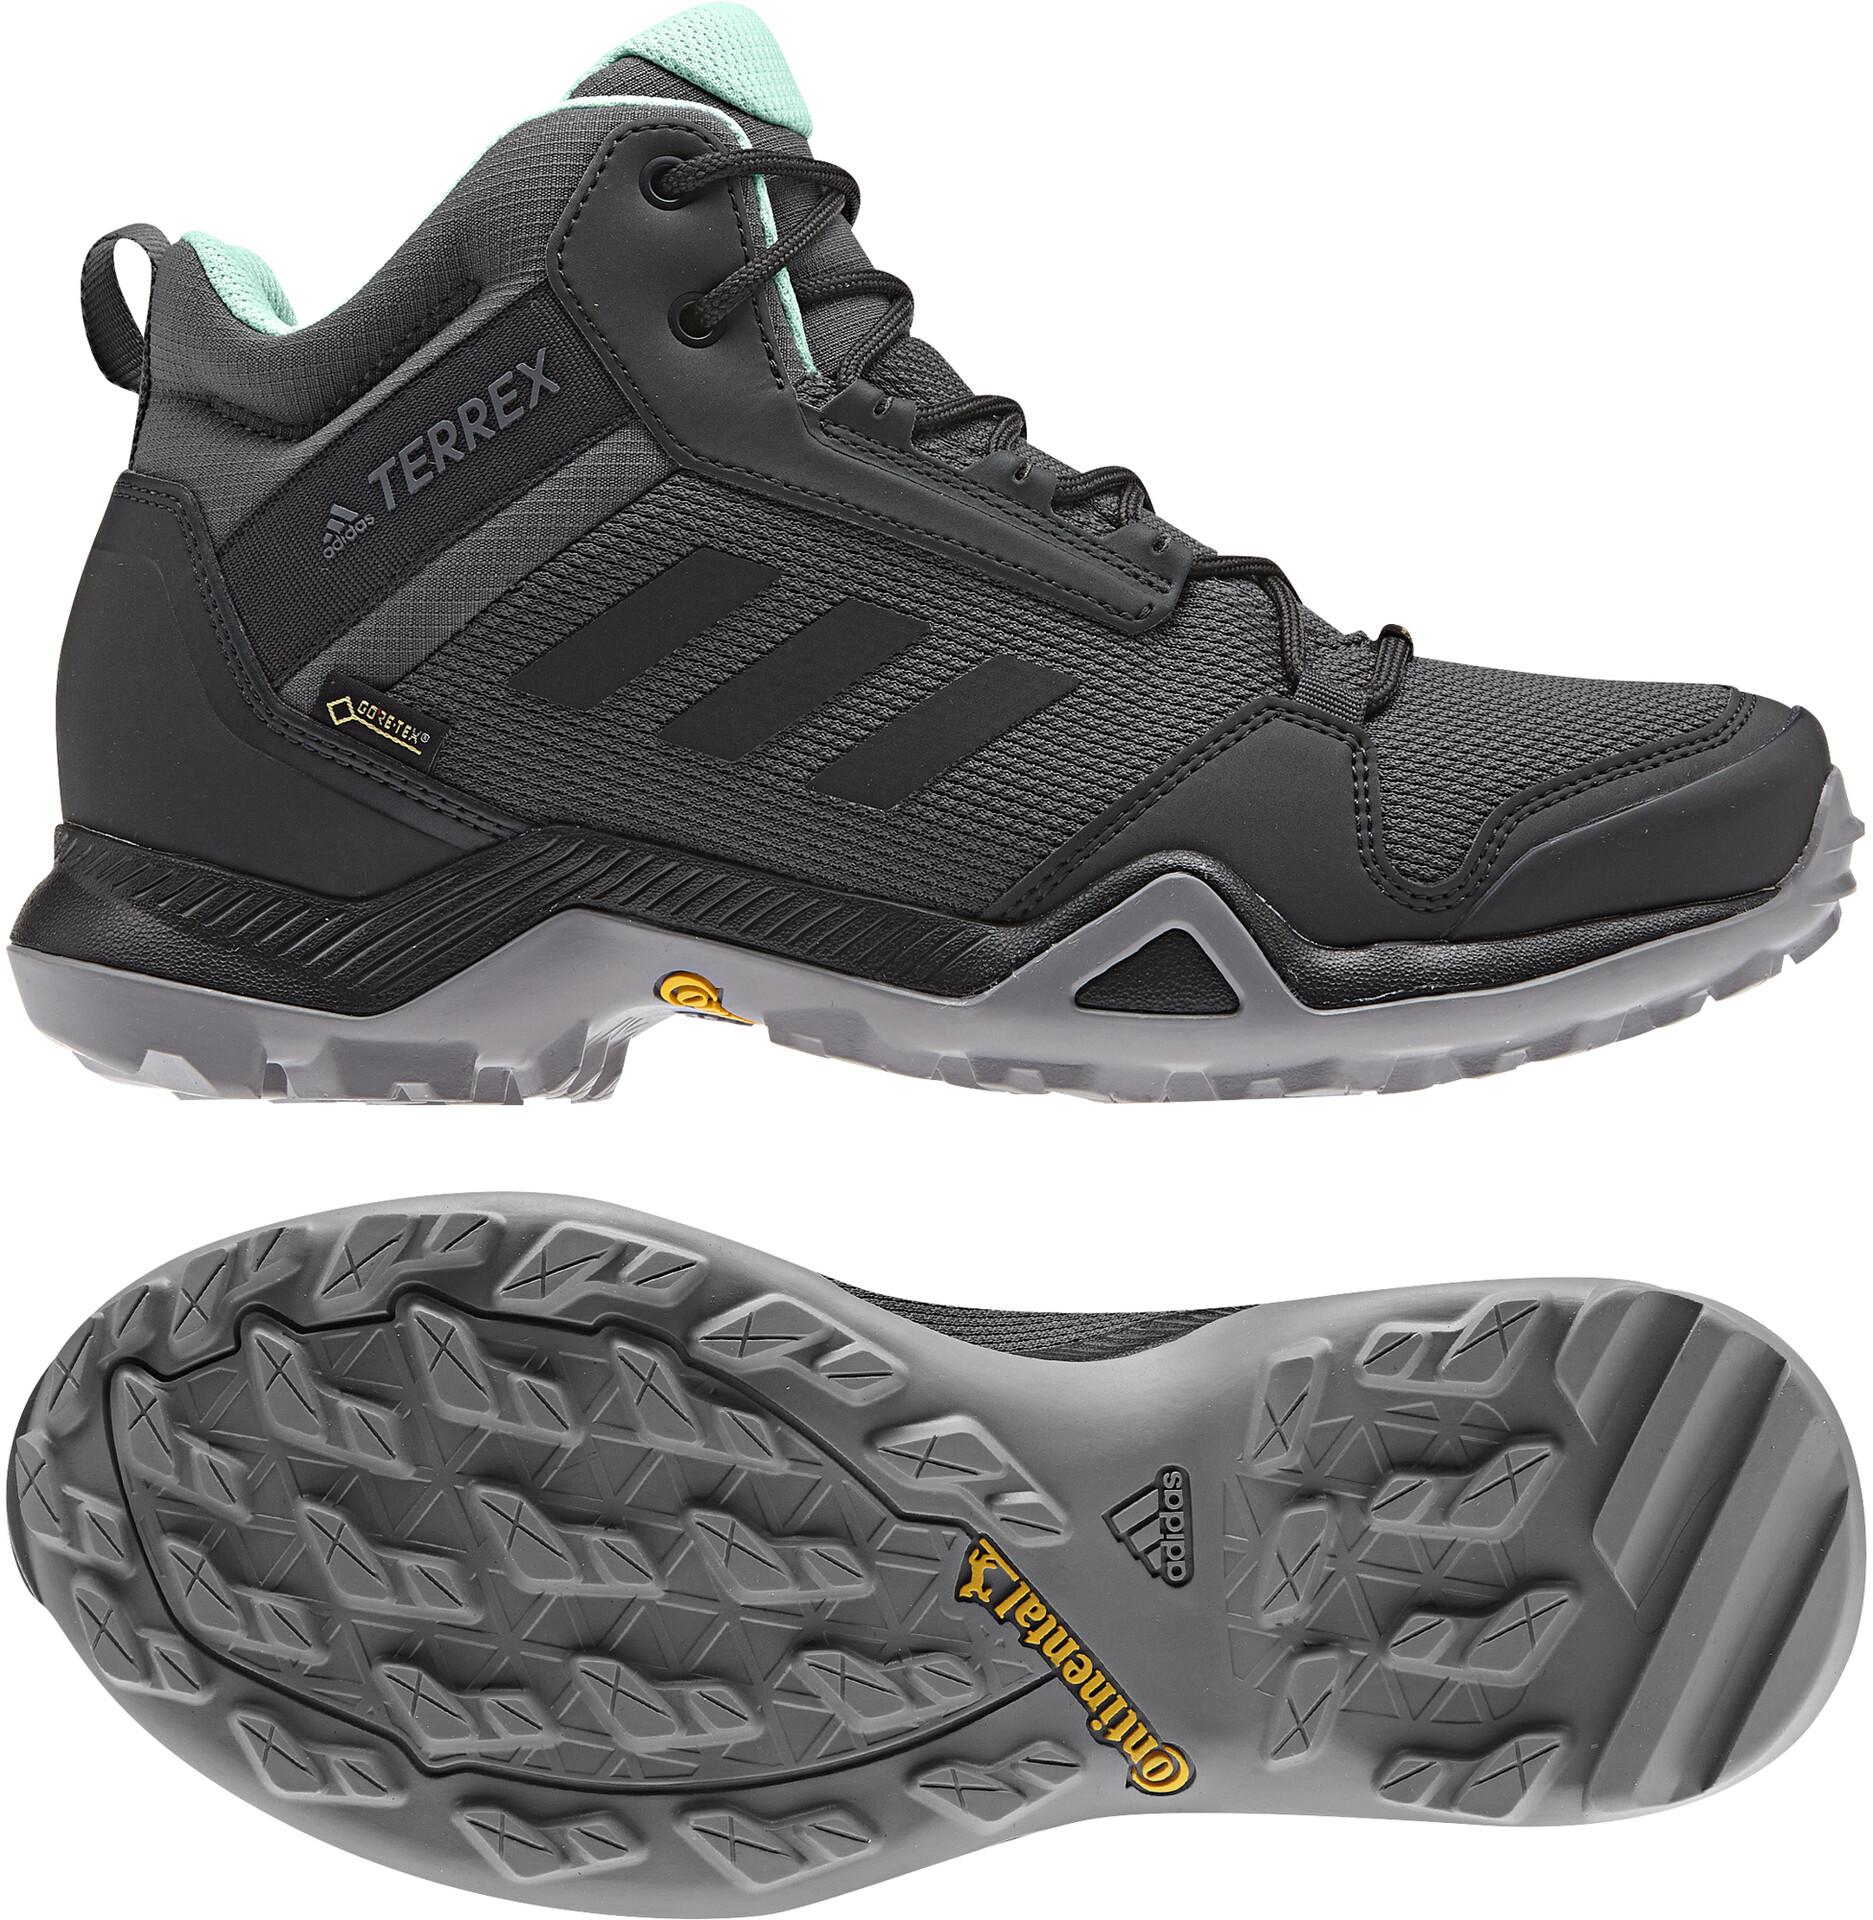 adidas TERREX AX3 Mid Gore Tex Chaussures de randonnée Femme, grey fivecore blackclear mint